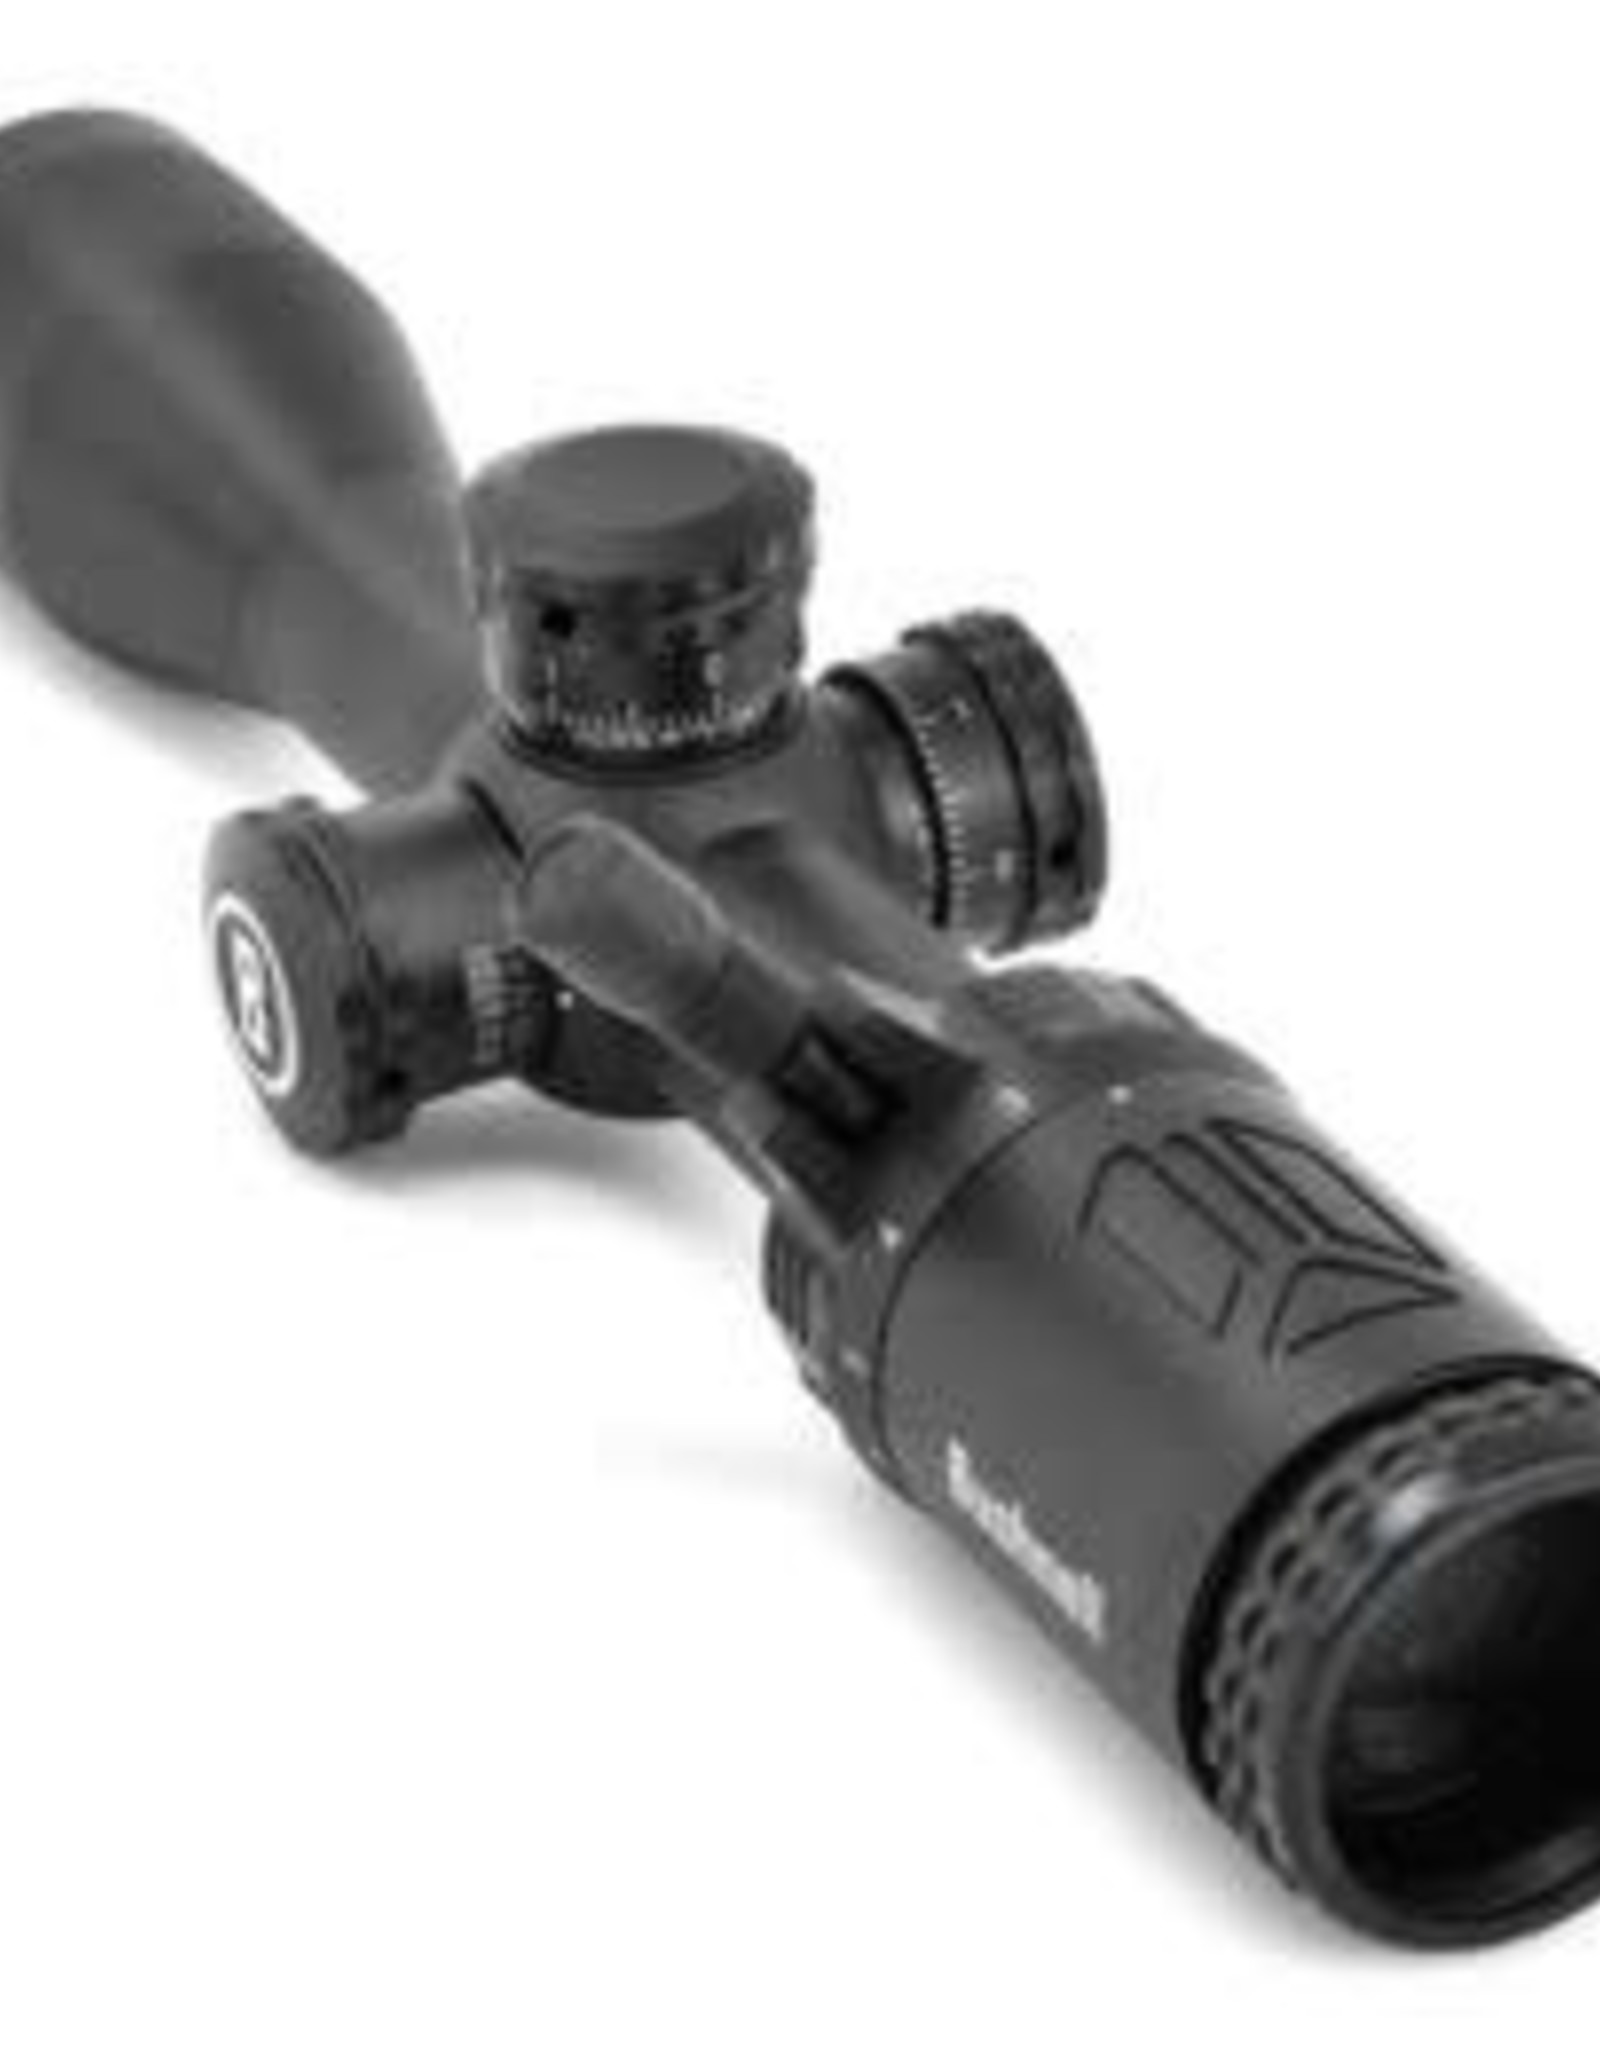 Bushnell Bushnell AR72736 AR Optics Riflescope 2-7X36 DZ 22LR, Box 6L